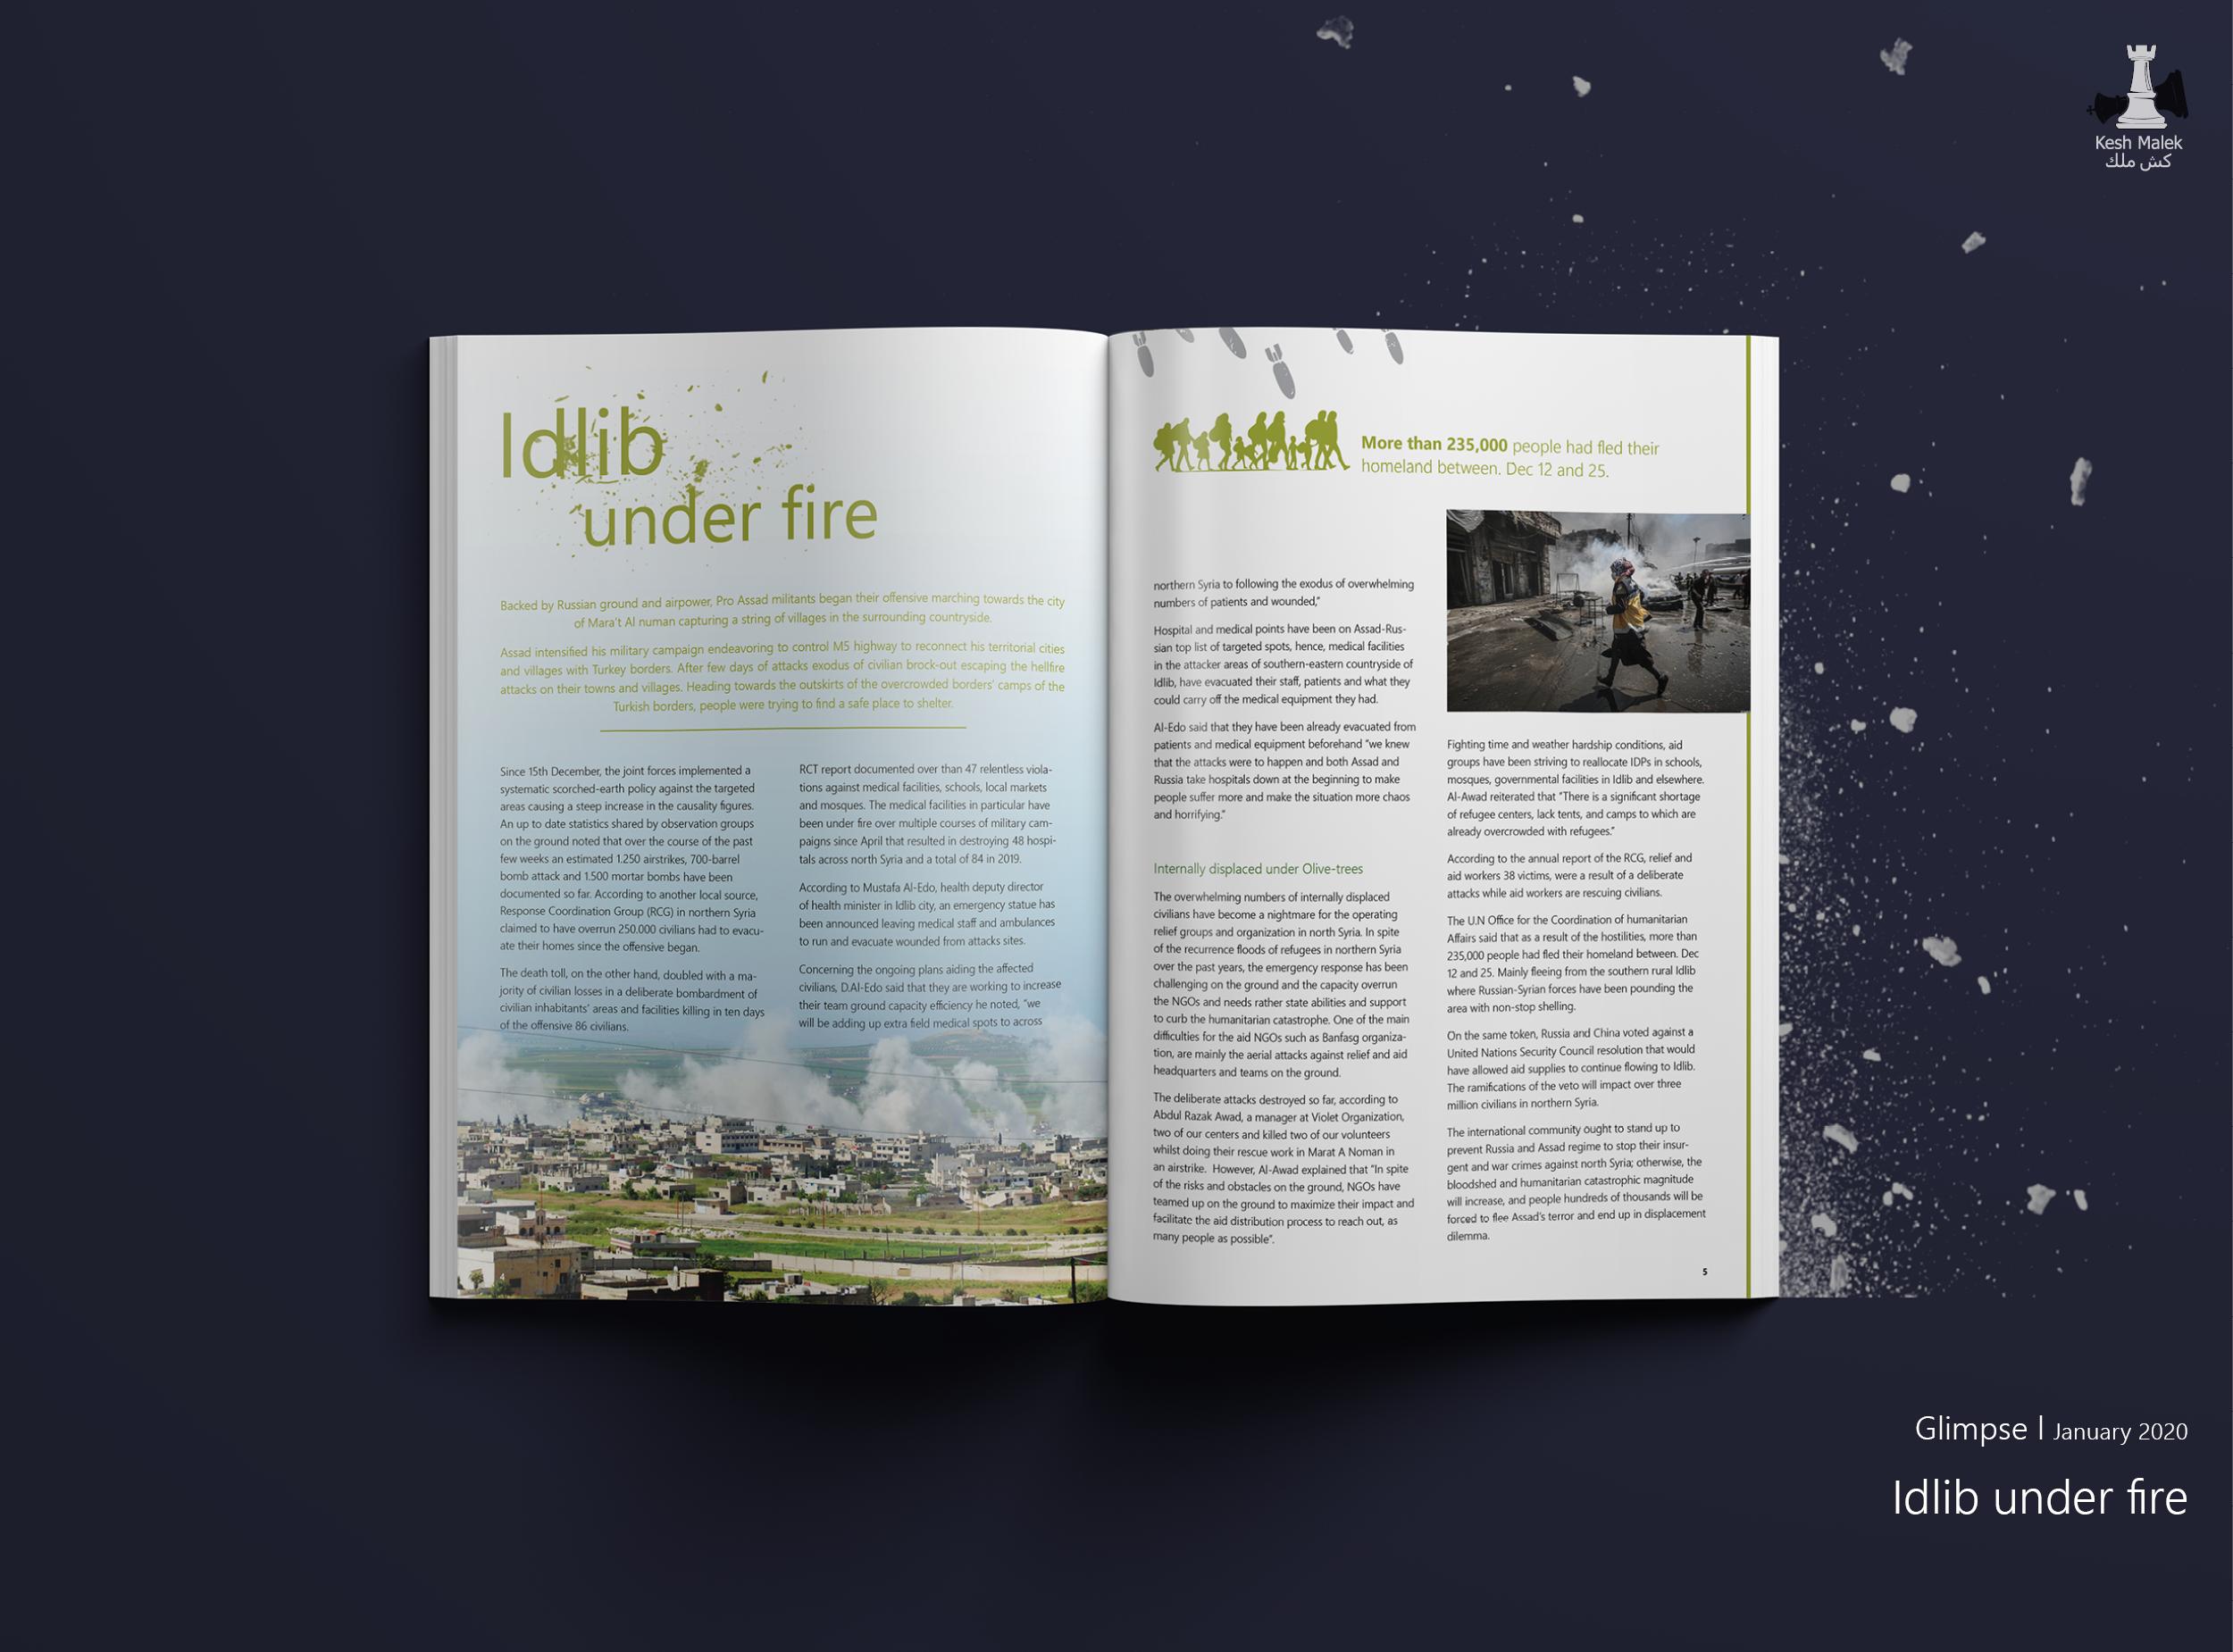 Idlib Under Fire Glimpse